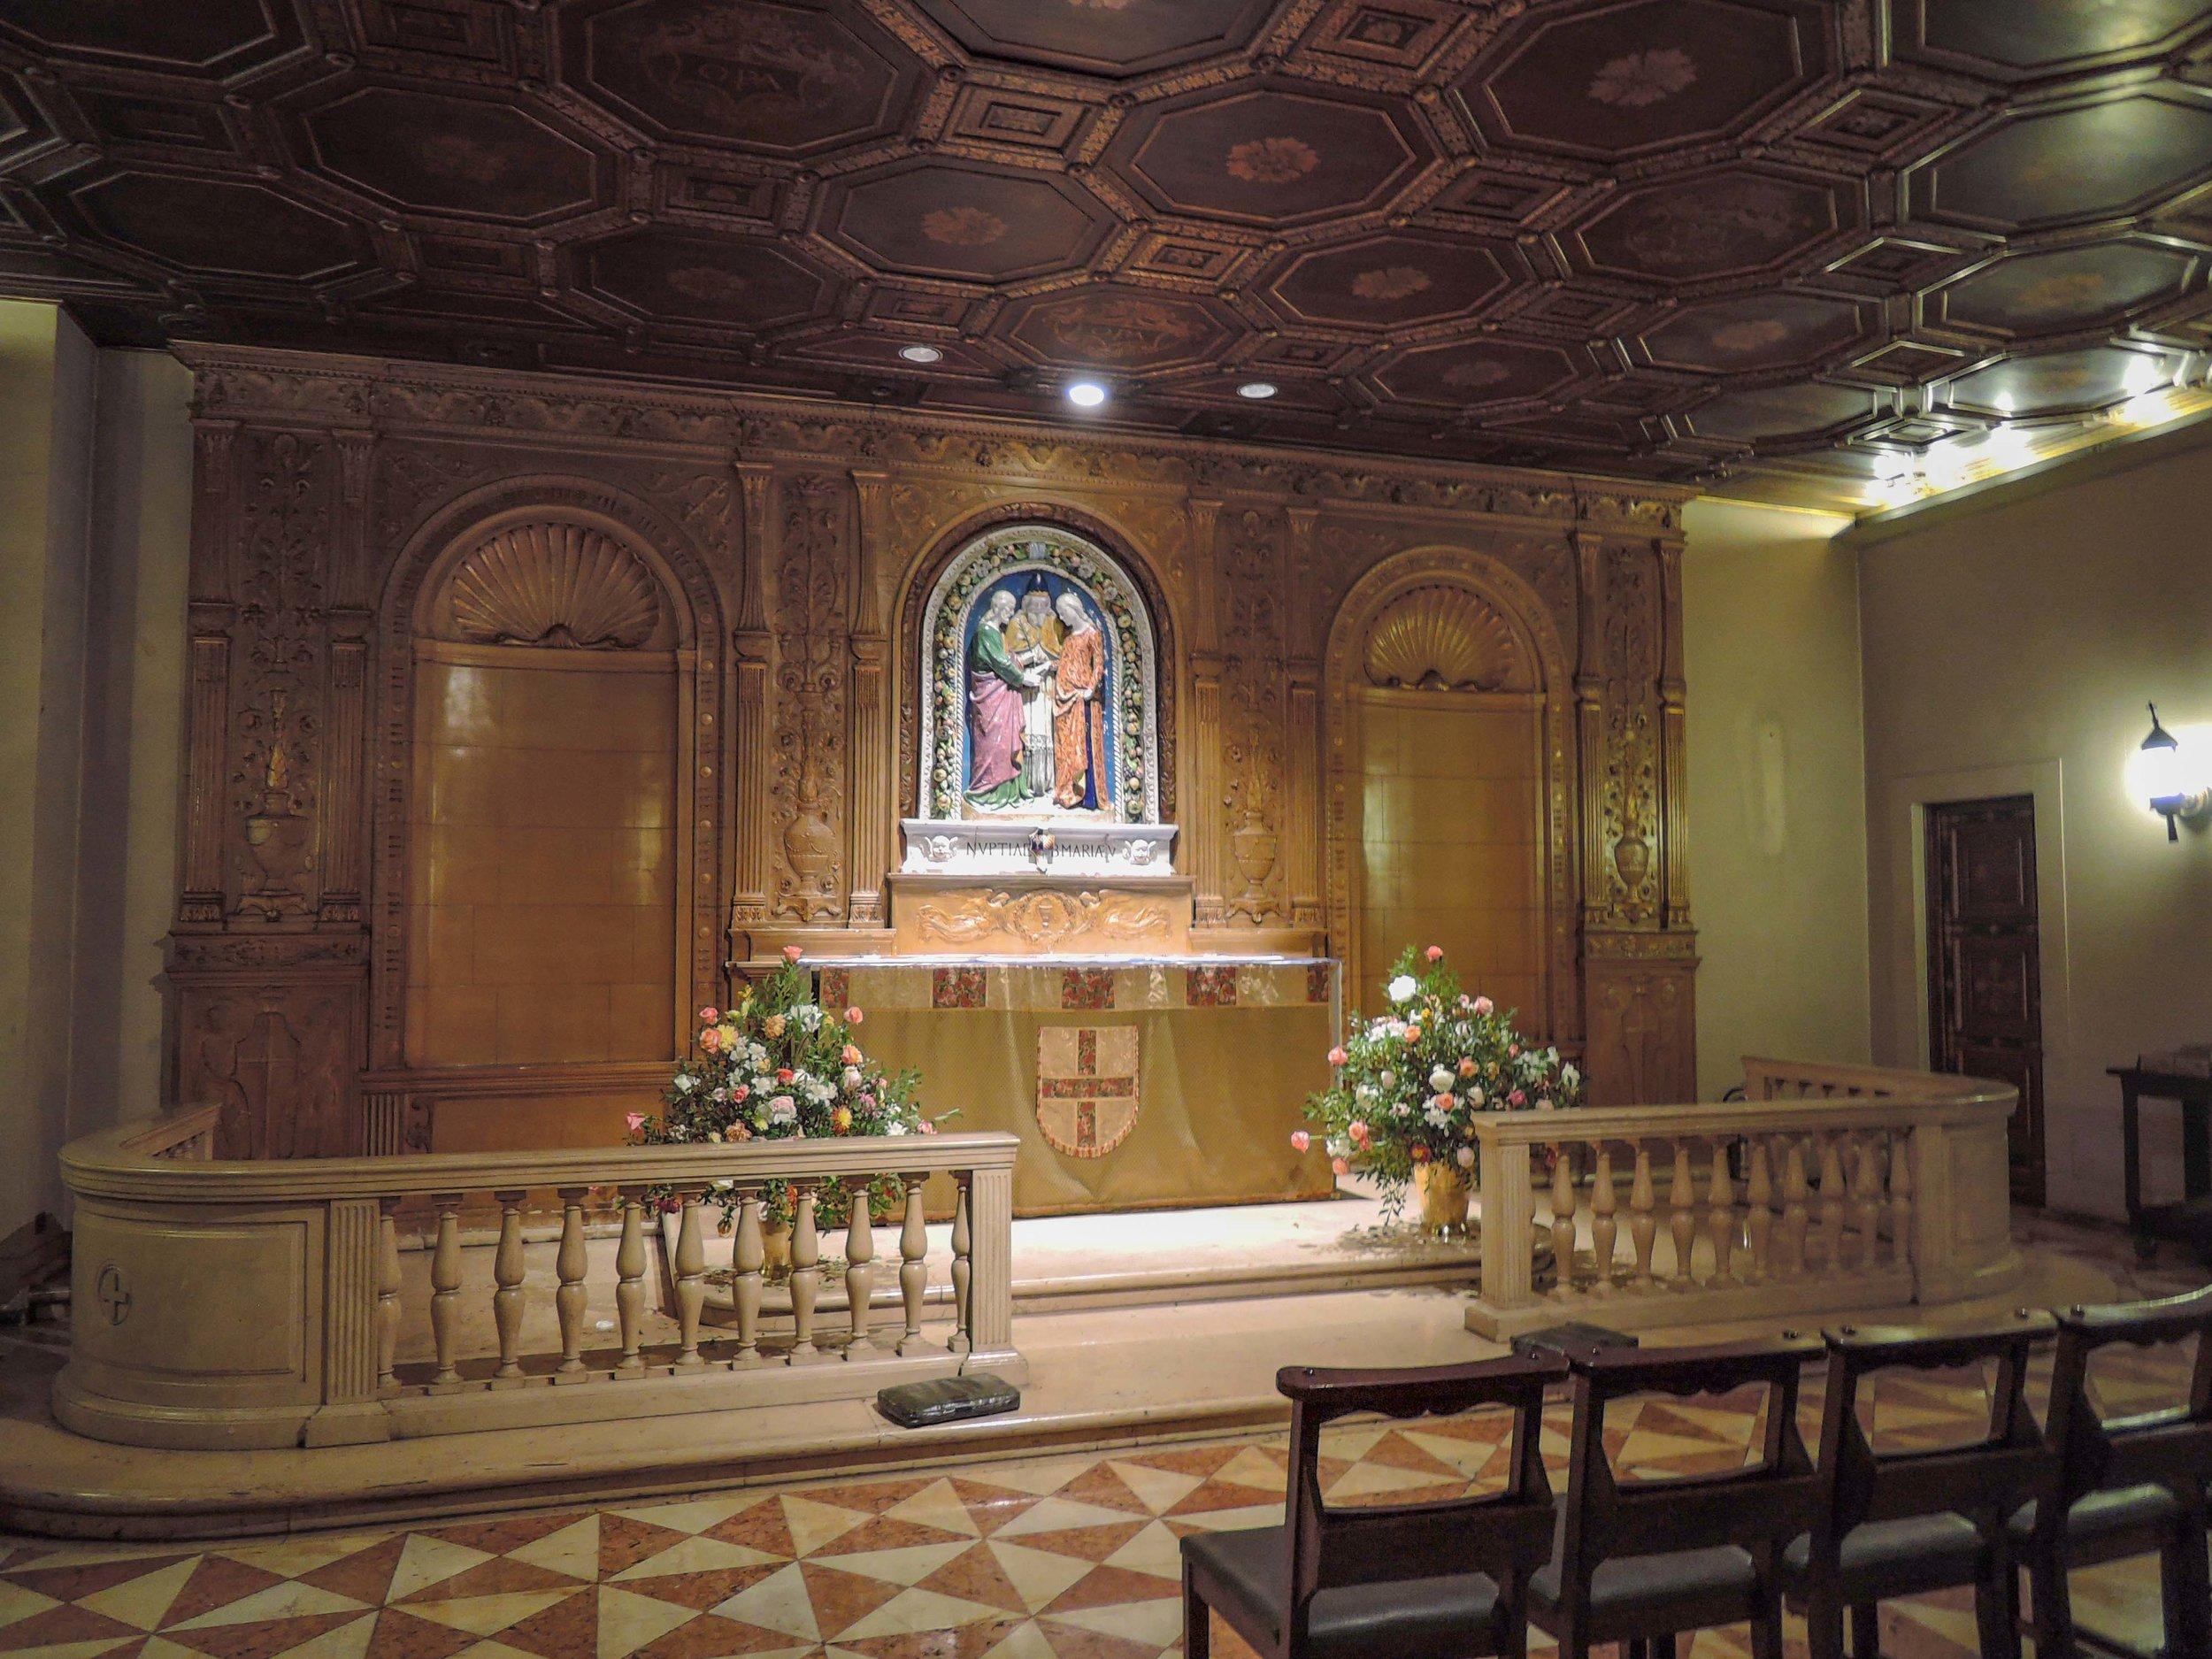 Saint Joseph's Chapel, Sunday, October 22, 2017